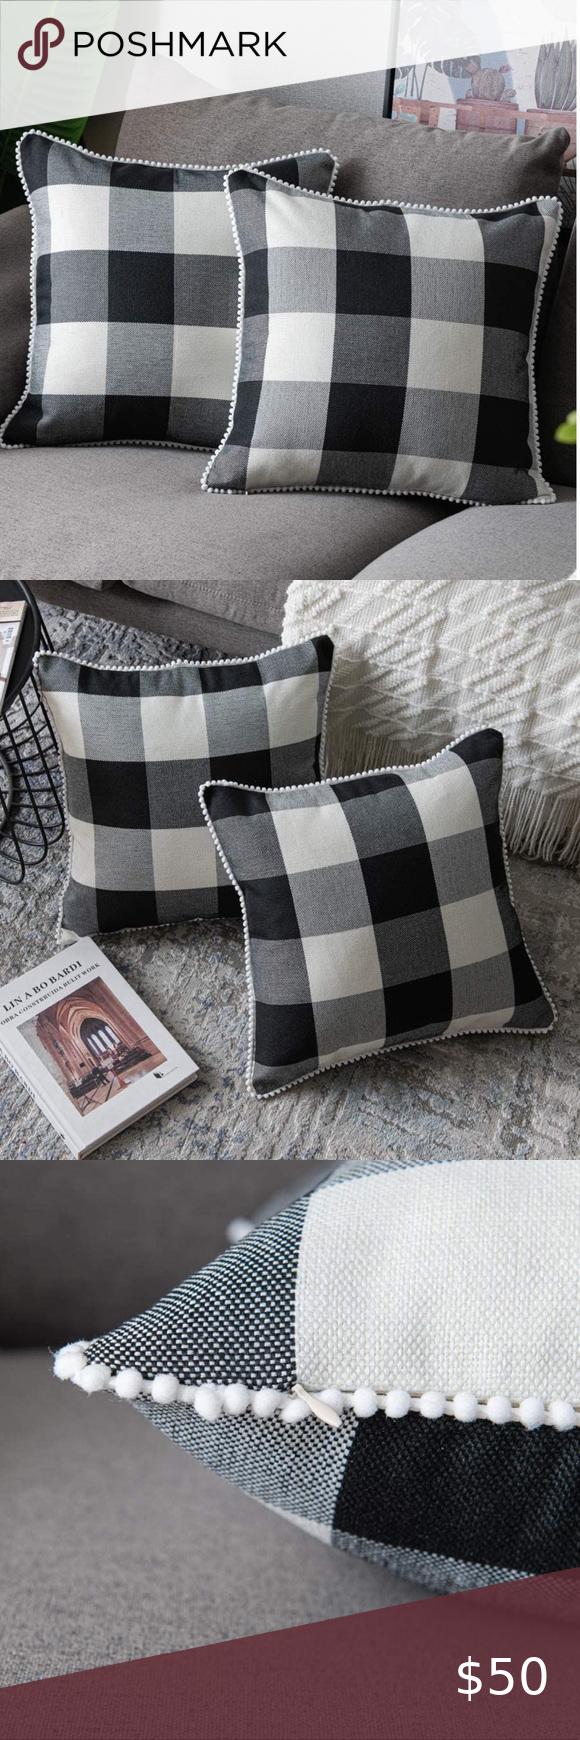 🛍NEW FARMHOUSE COVER SET 🛍 NEW Throw Pillow Covers SET 2 Throw Pillow Case...